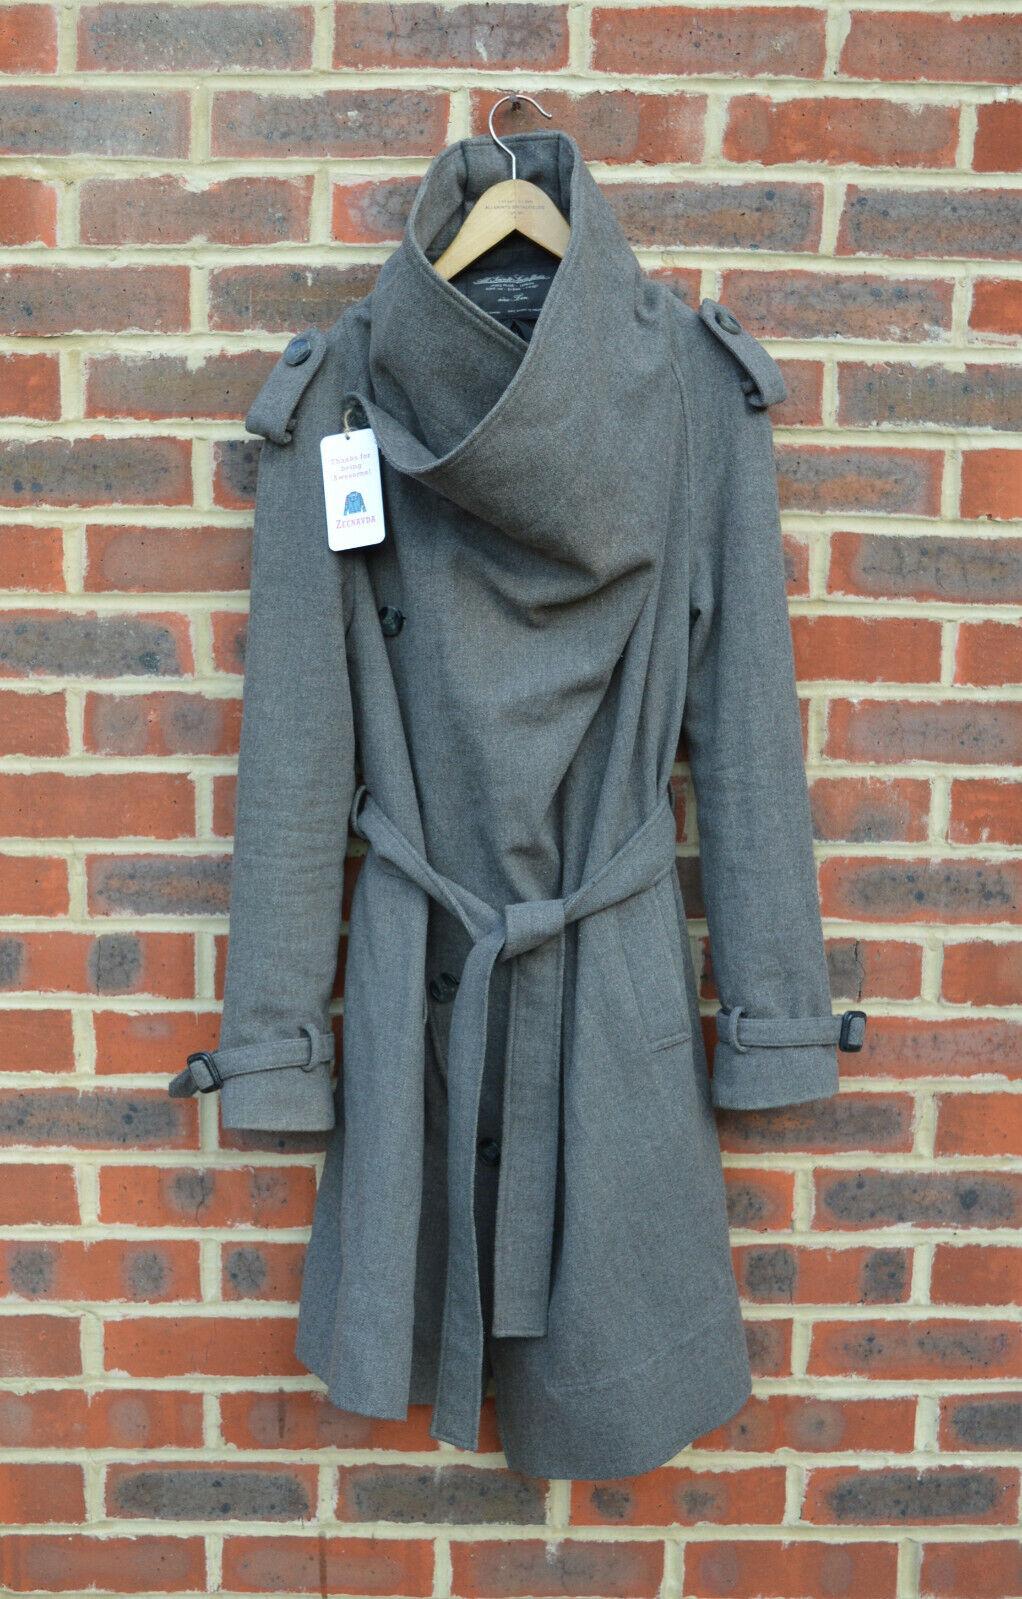 *WOW* AllSaints Ladies NAHARA Woolen Coat UK10-12 US6-8 Trench saredon Grey 2